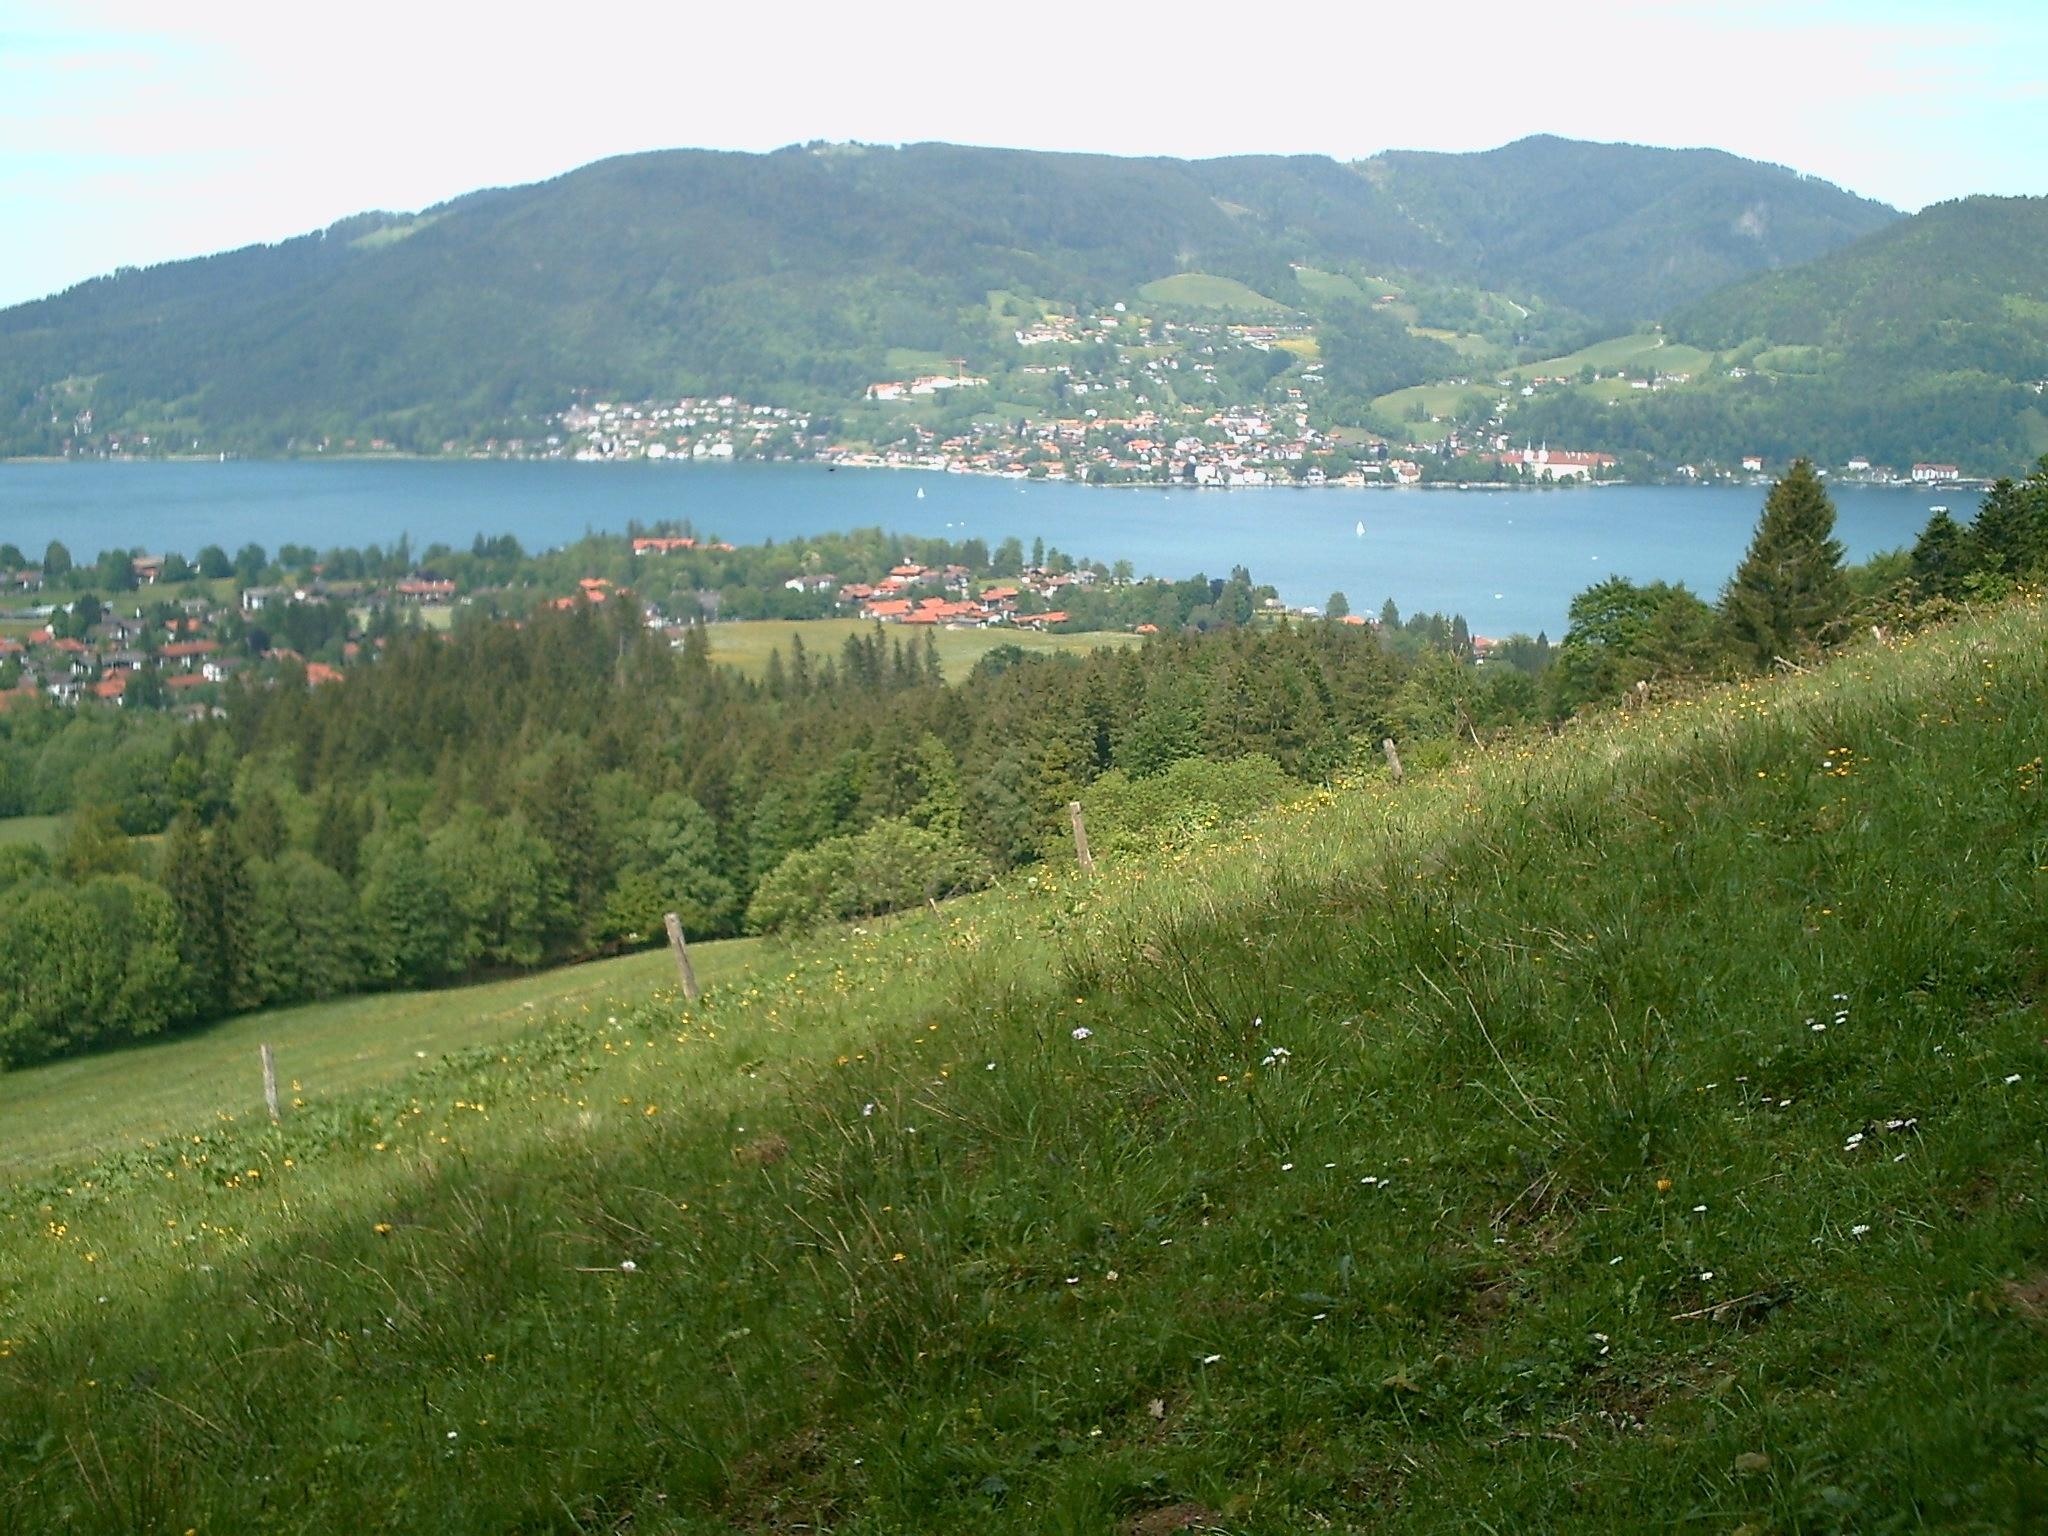 Bad Wiessee, Bavaria, Germany